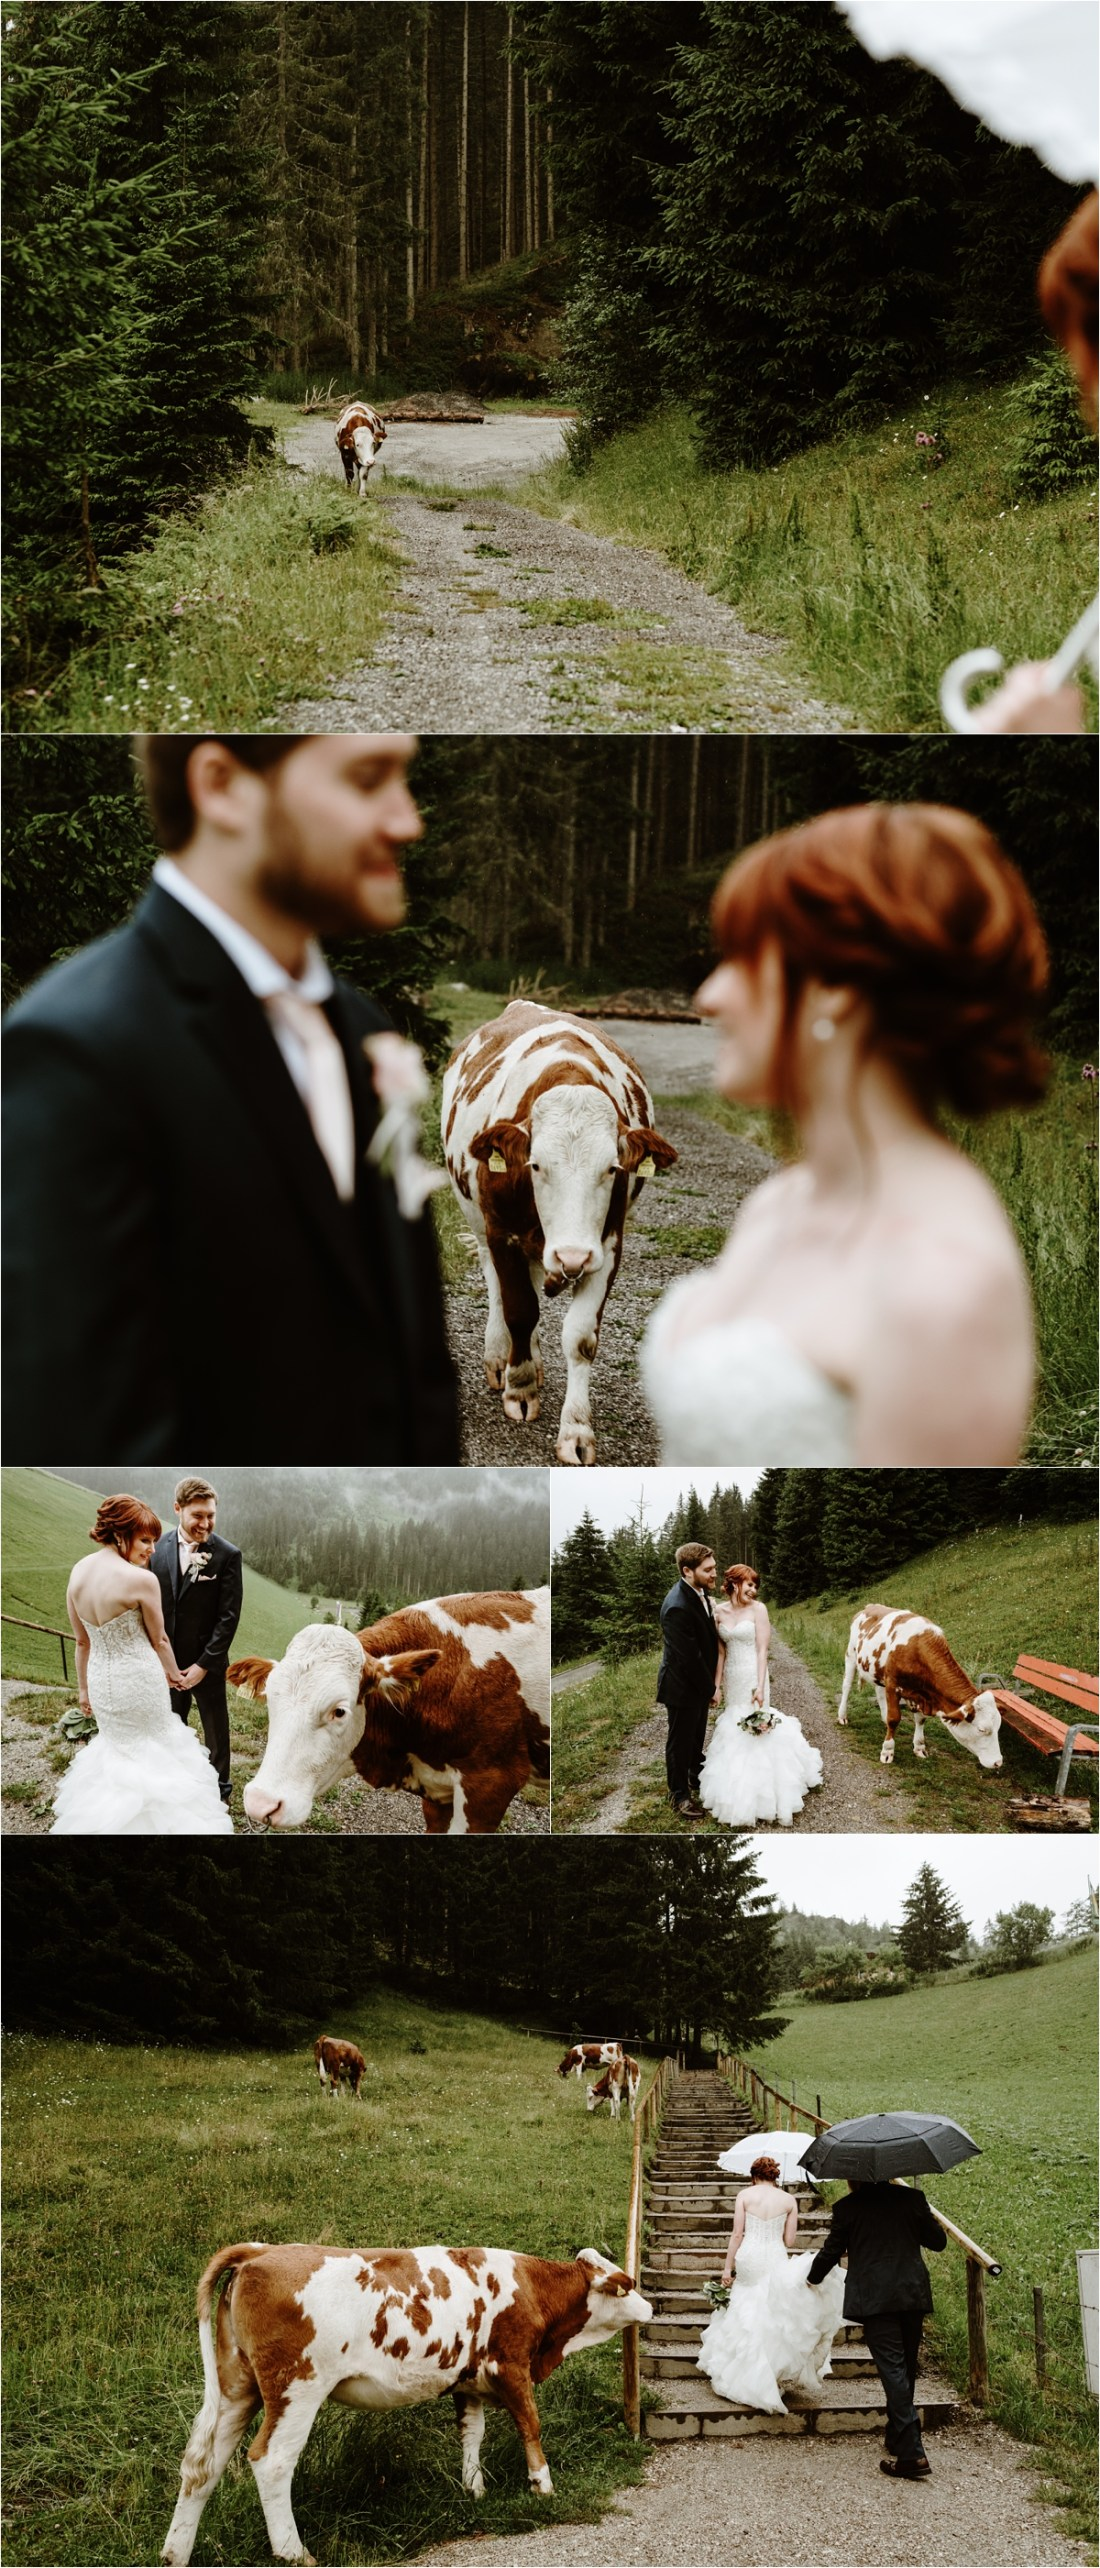 A cow follows Emma & Adam as they walk along a mountain path in Gerlos Austria after their mountain wedding. Photos by Wild Connections Photography